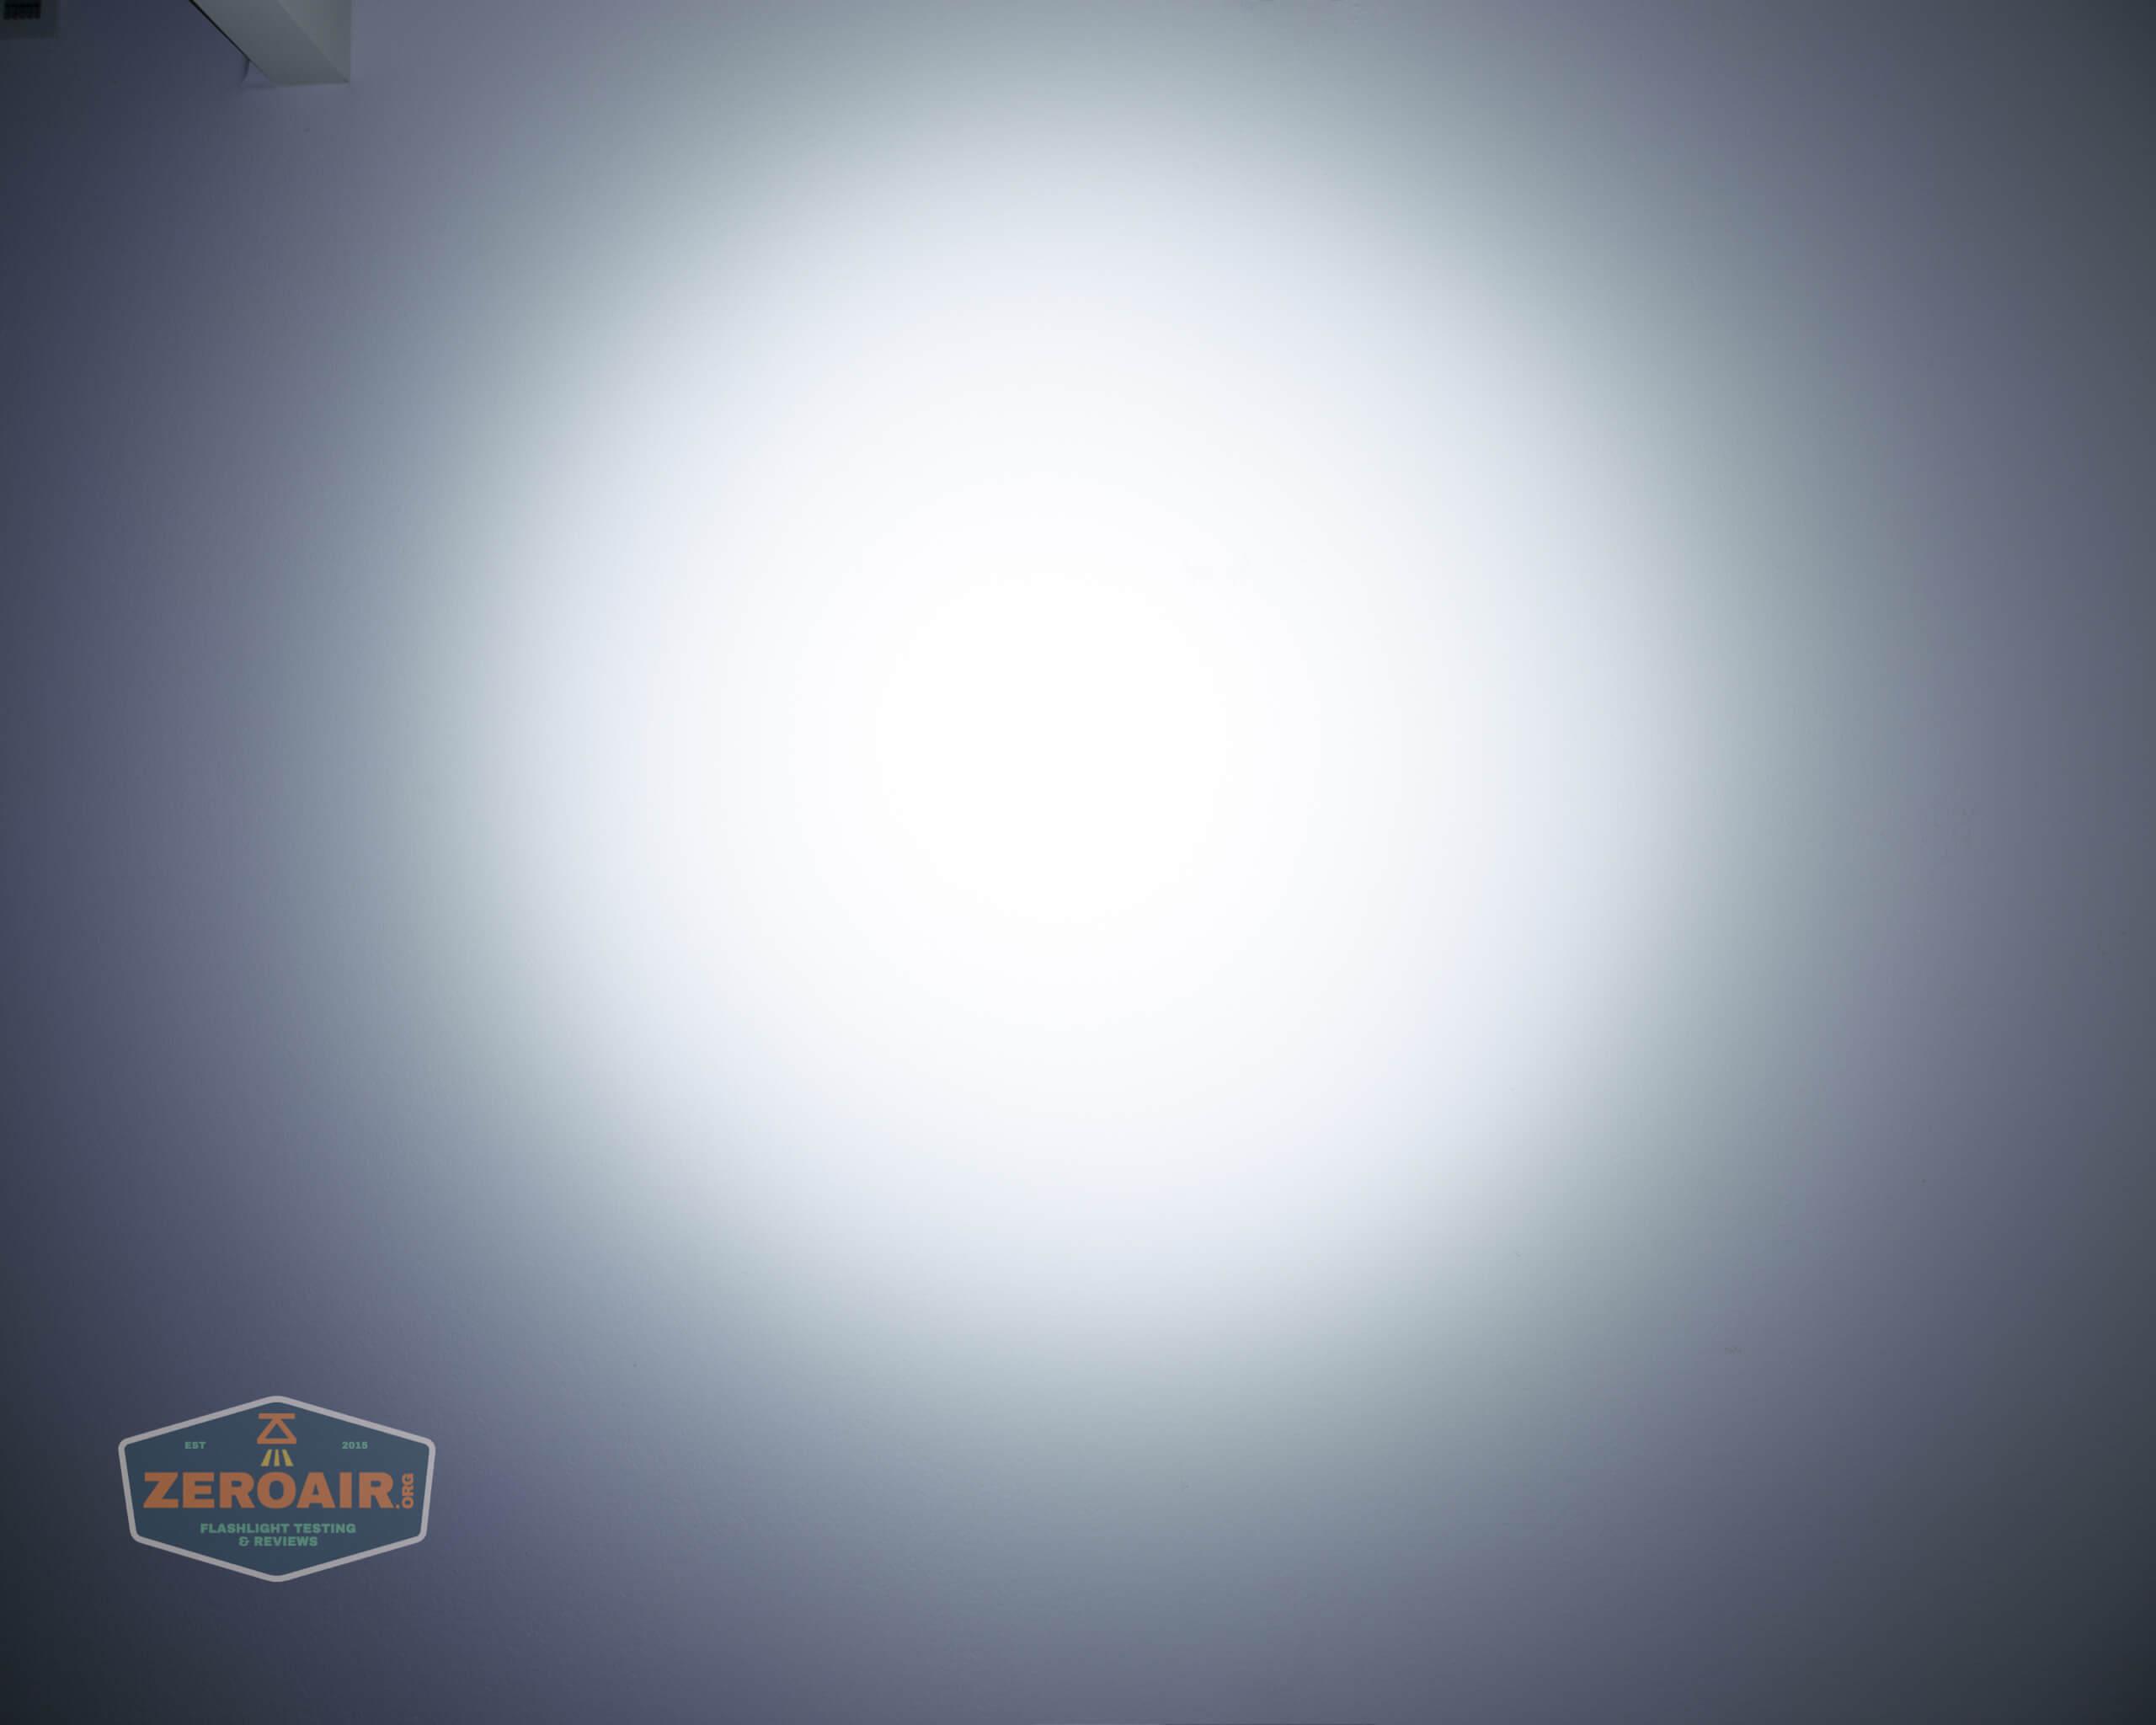 olight perun 2 21700 headlamp orange beamshot ceiling 5